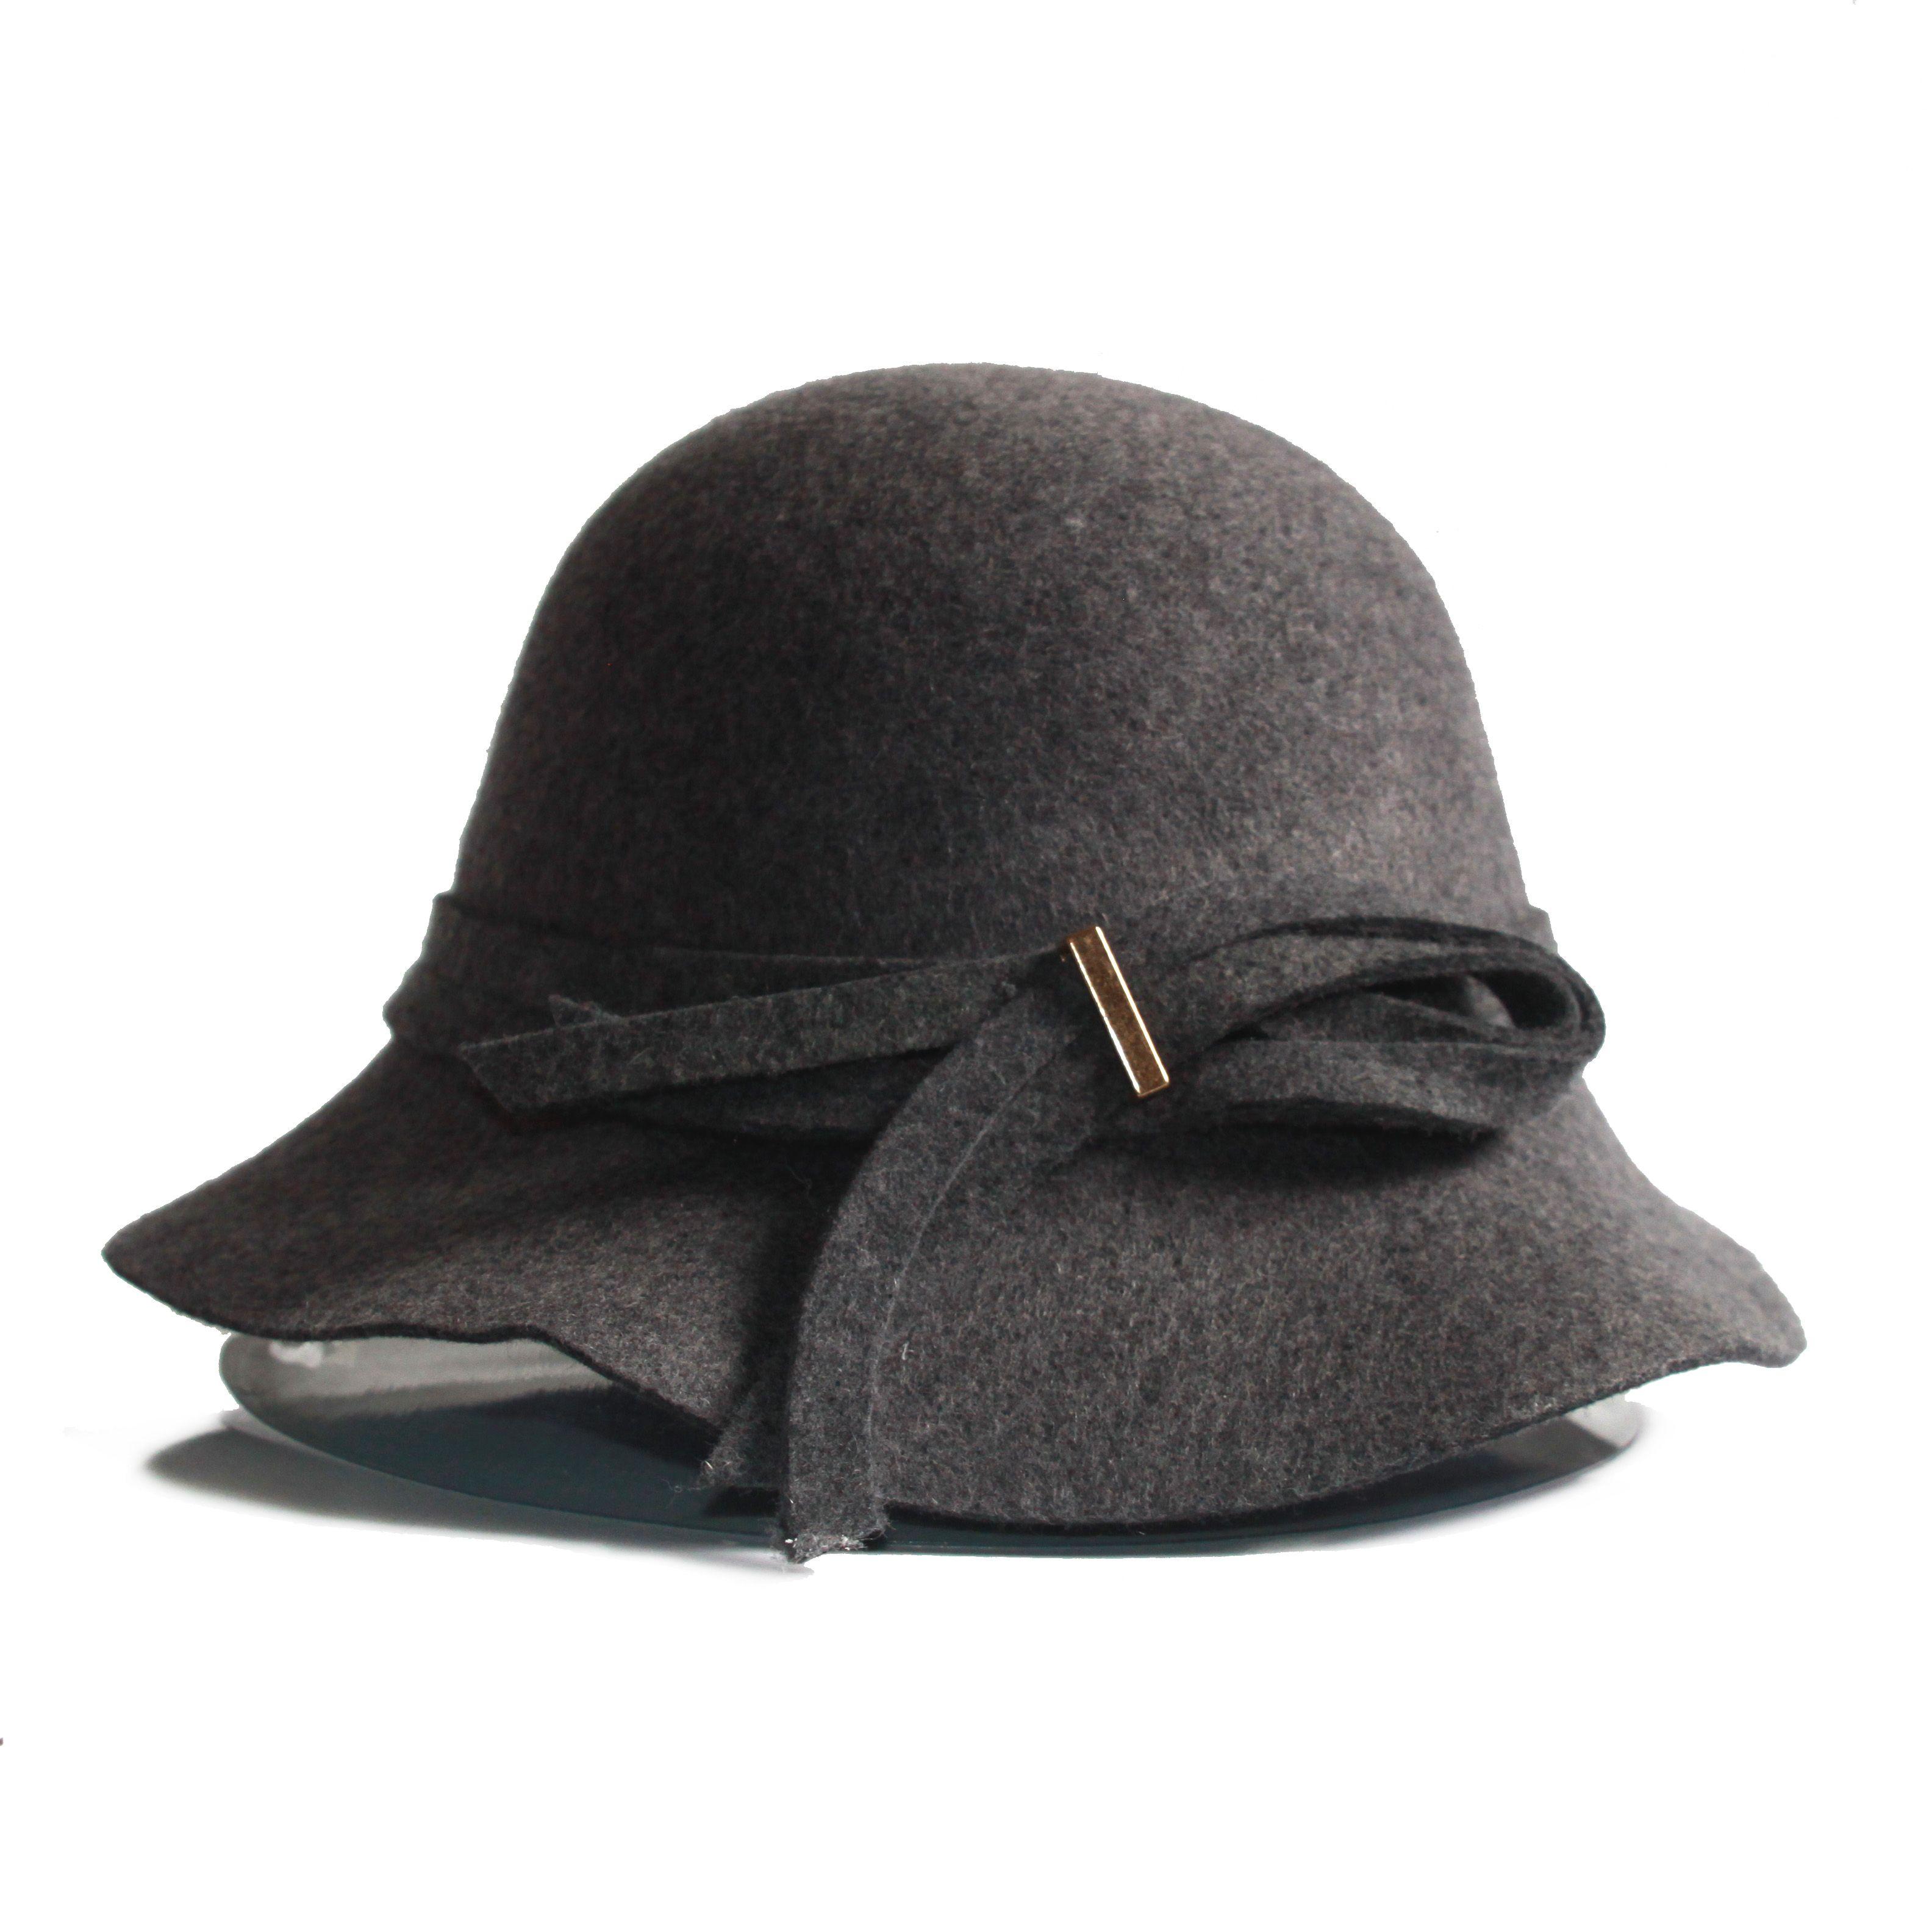 Compre Sombrero De Fieltro De Lana De 100% Para Mujeres A  25.82 Del  Joyce11  6a20a0f13bf